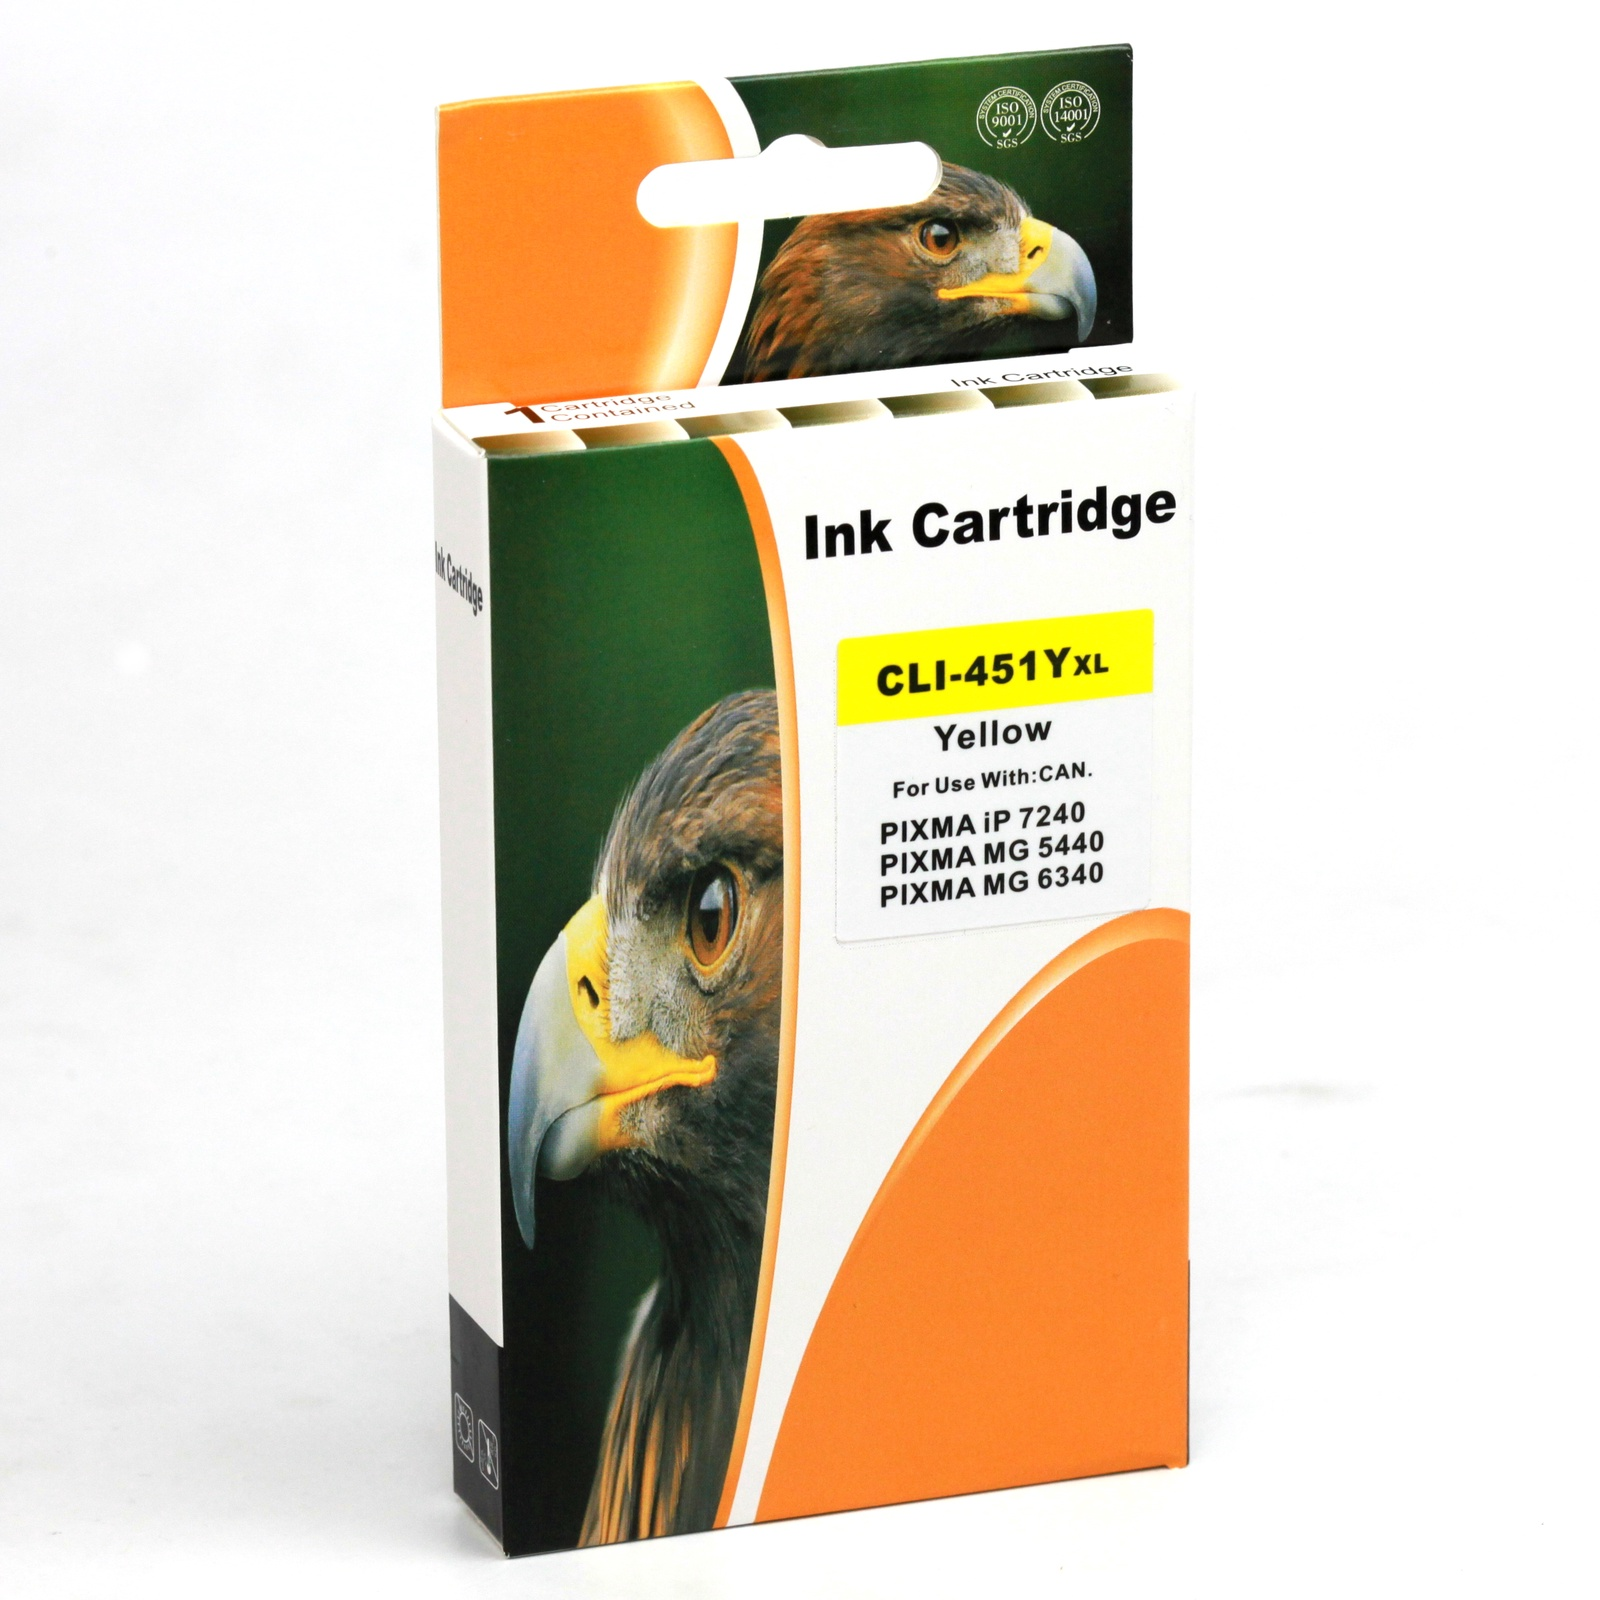 Картридж Inko для CLI-451Y XL желтый повышенной емкости картридж canon cli 451y 6526b001 для canon pixma ip7240 mg6340 mg5440 желтый